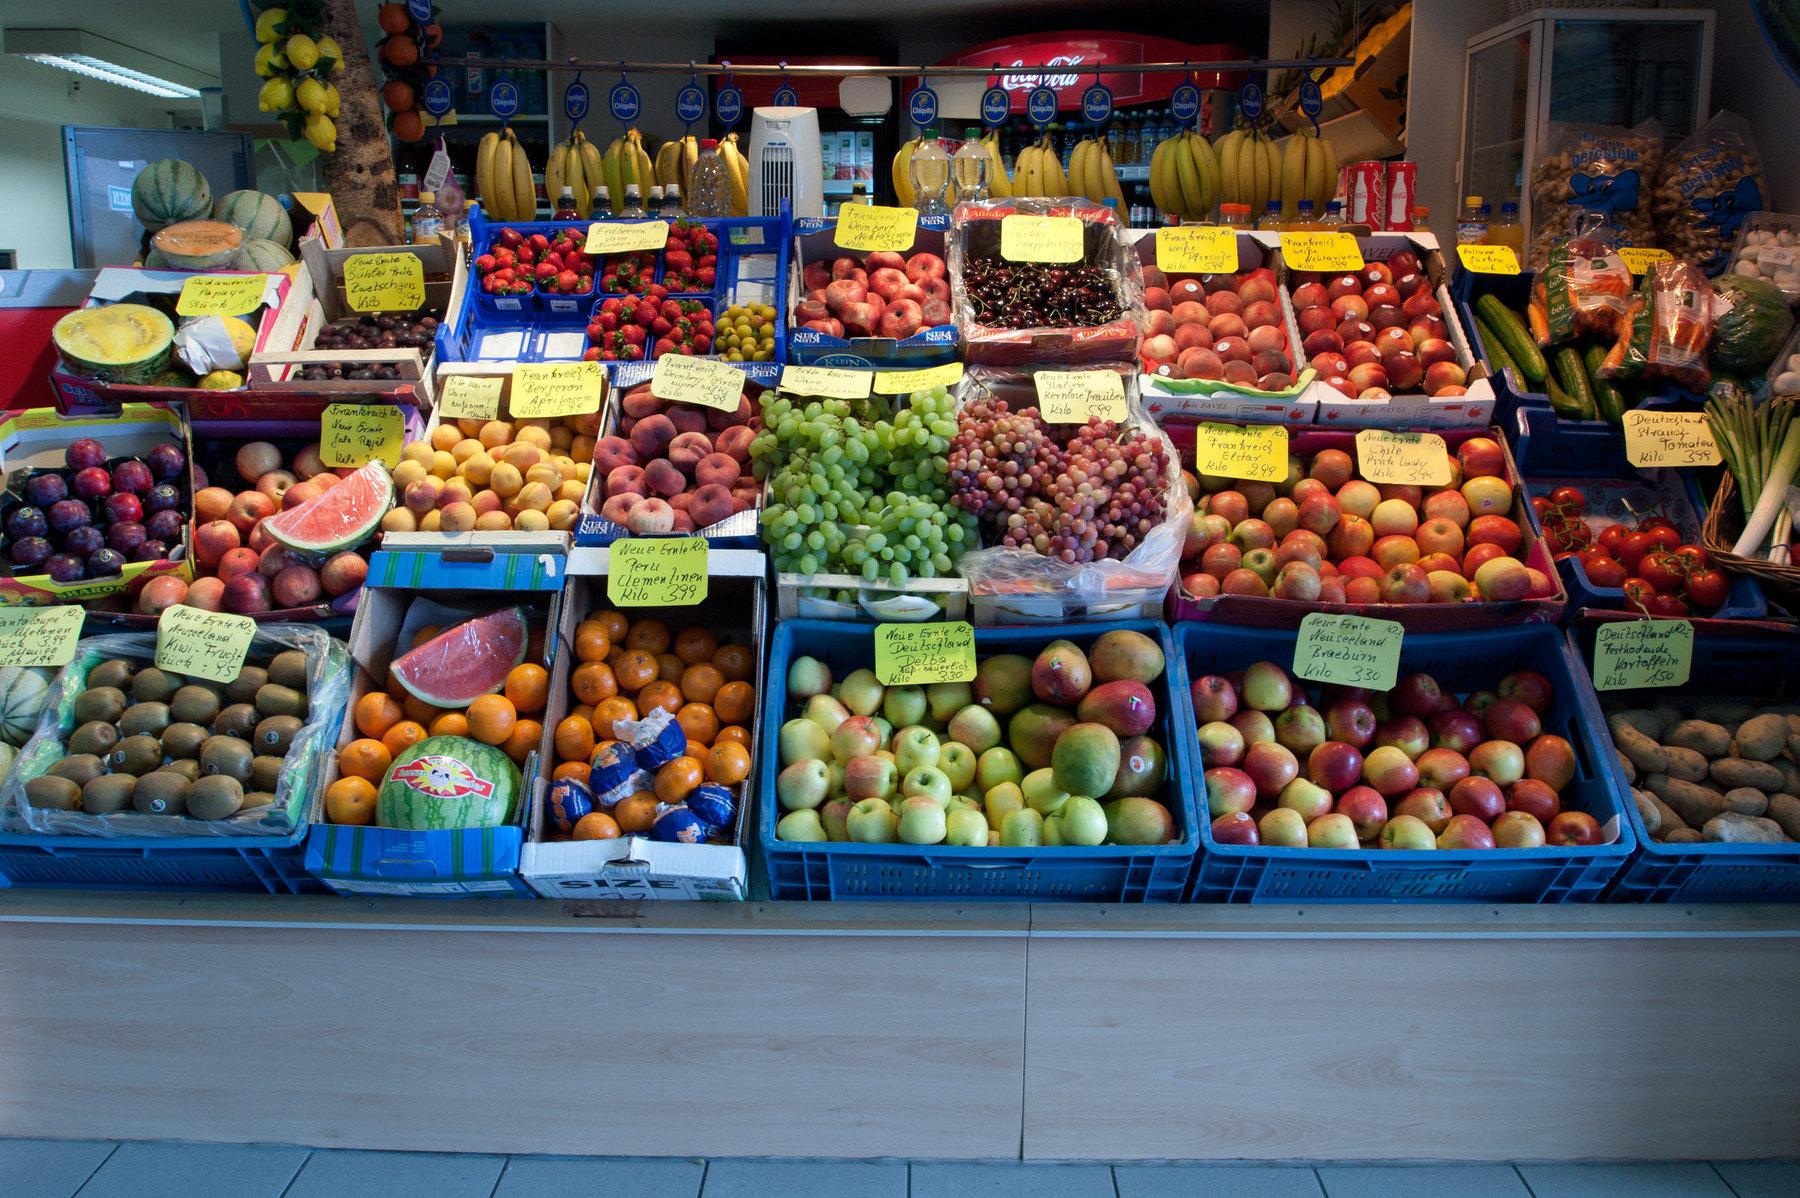 Symbol_Lebensmittel_Obst_Gemüse-16